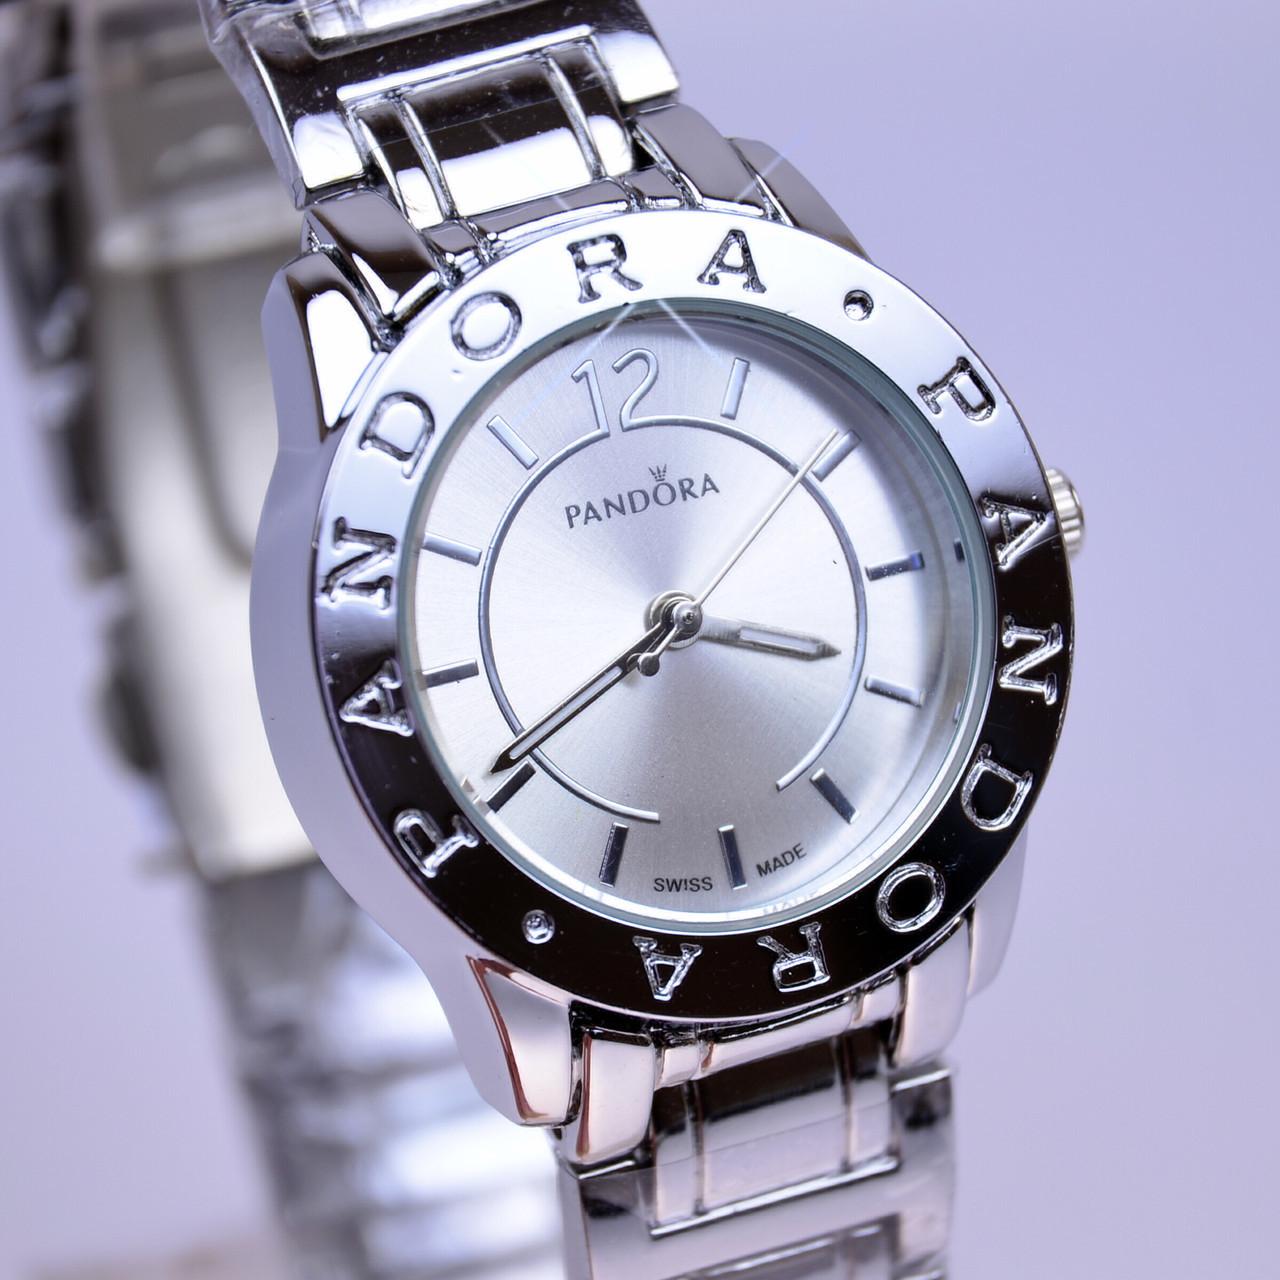 d22274357659 Женские наручные часы PANDORA (Пандора) Silver 32 мм: продажа, цена ...